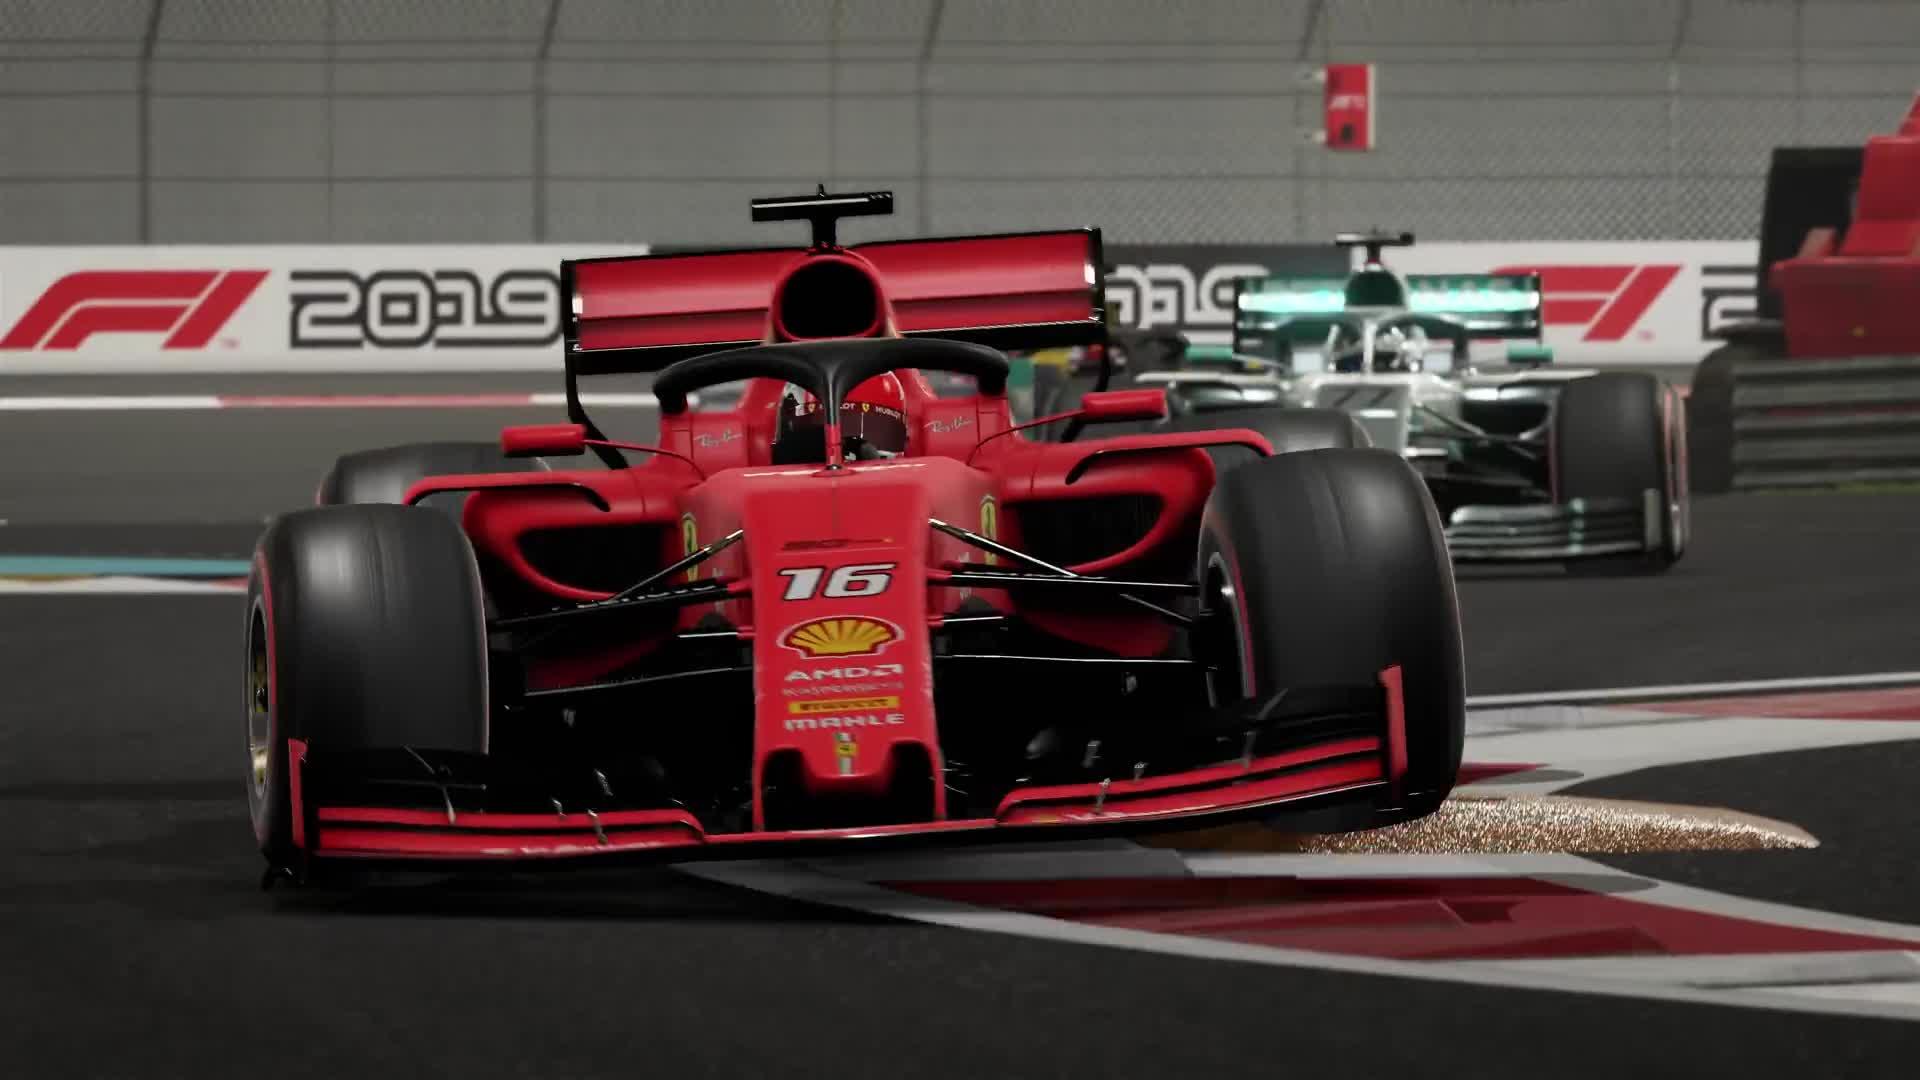 Trailer, Rennspiel, Codemasters, Formel 1, F1, Rennsimulation, F1 2019